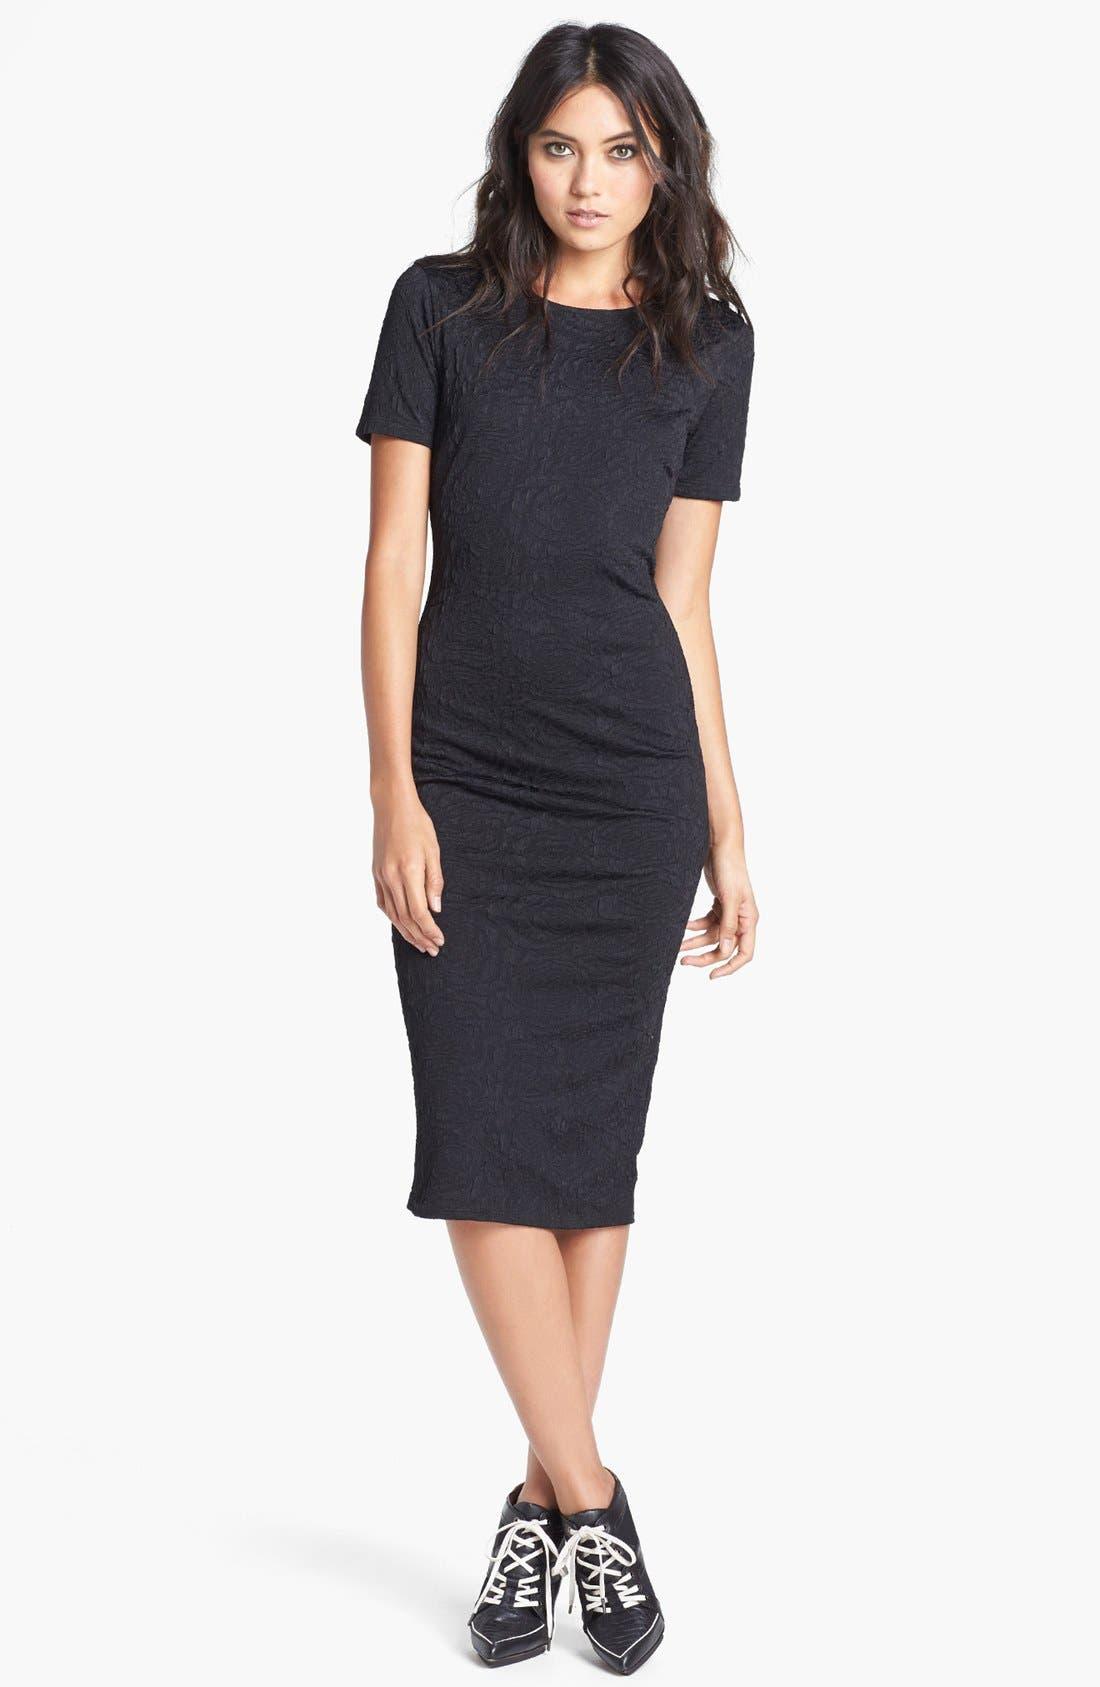 Alternate Image 1 Selected - Tildon Textured Body-Con Dress